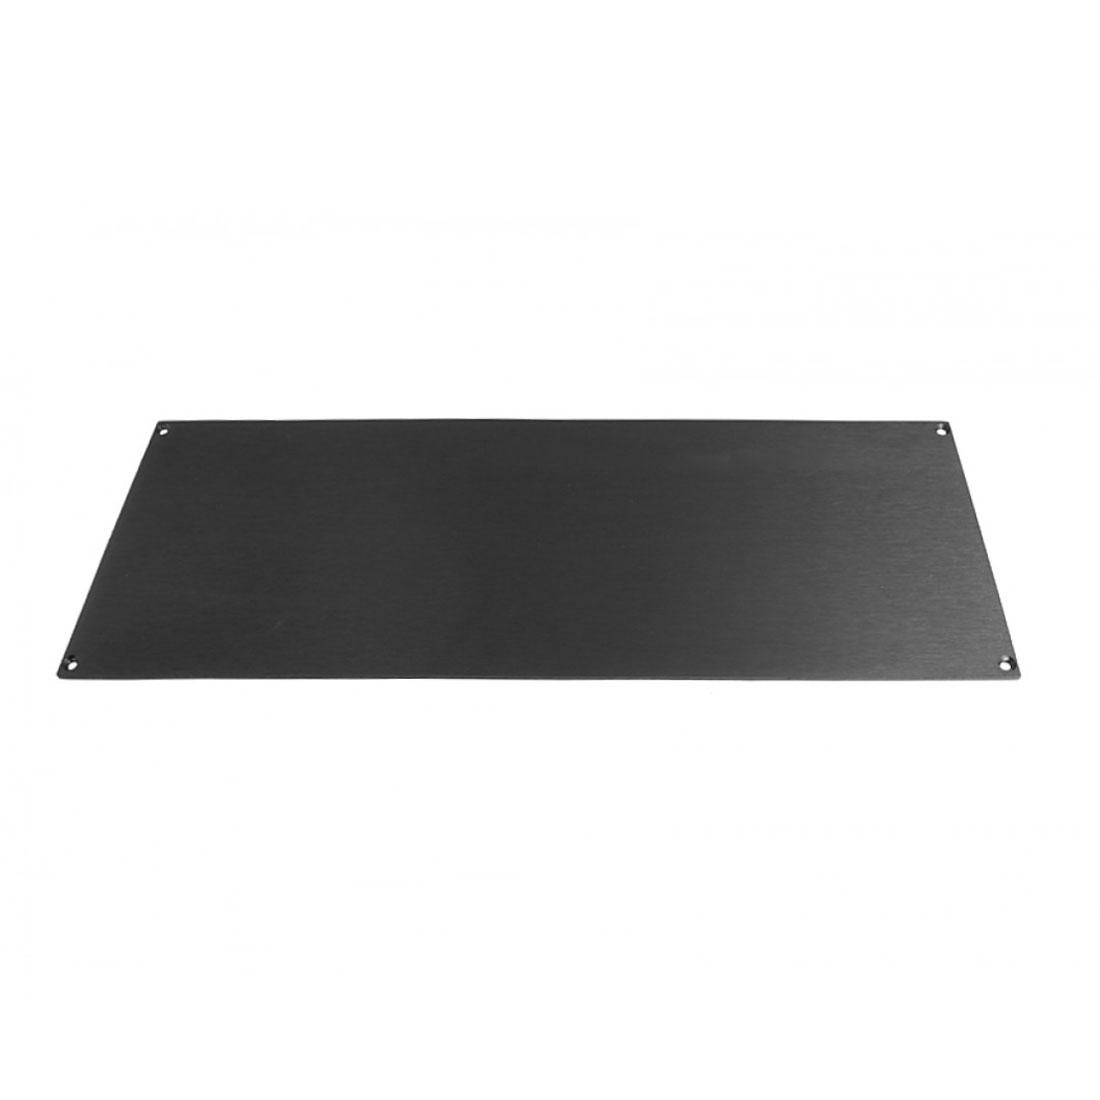 1NSL04170B - 4U rack krabice s lištou, 170mm, 10mm - panel stříbrný